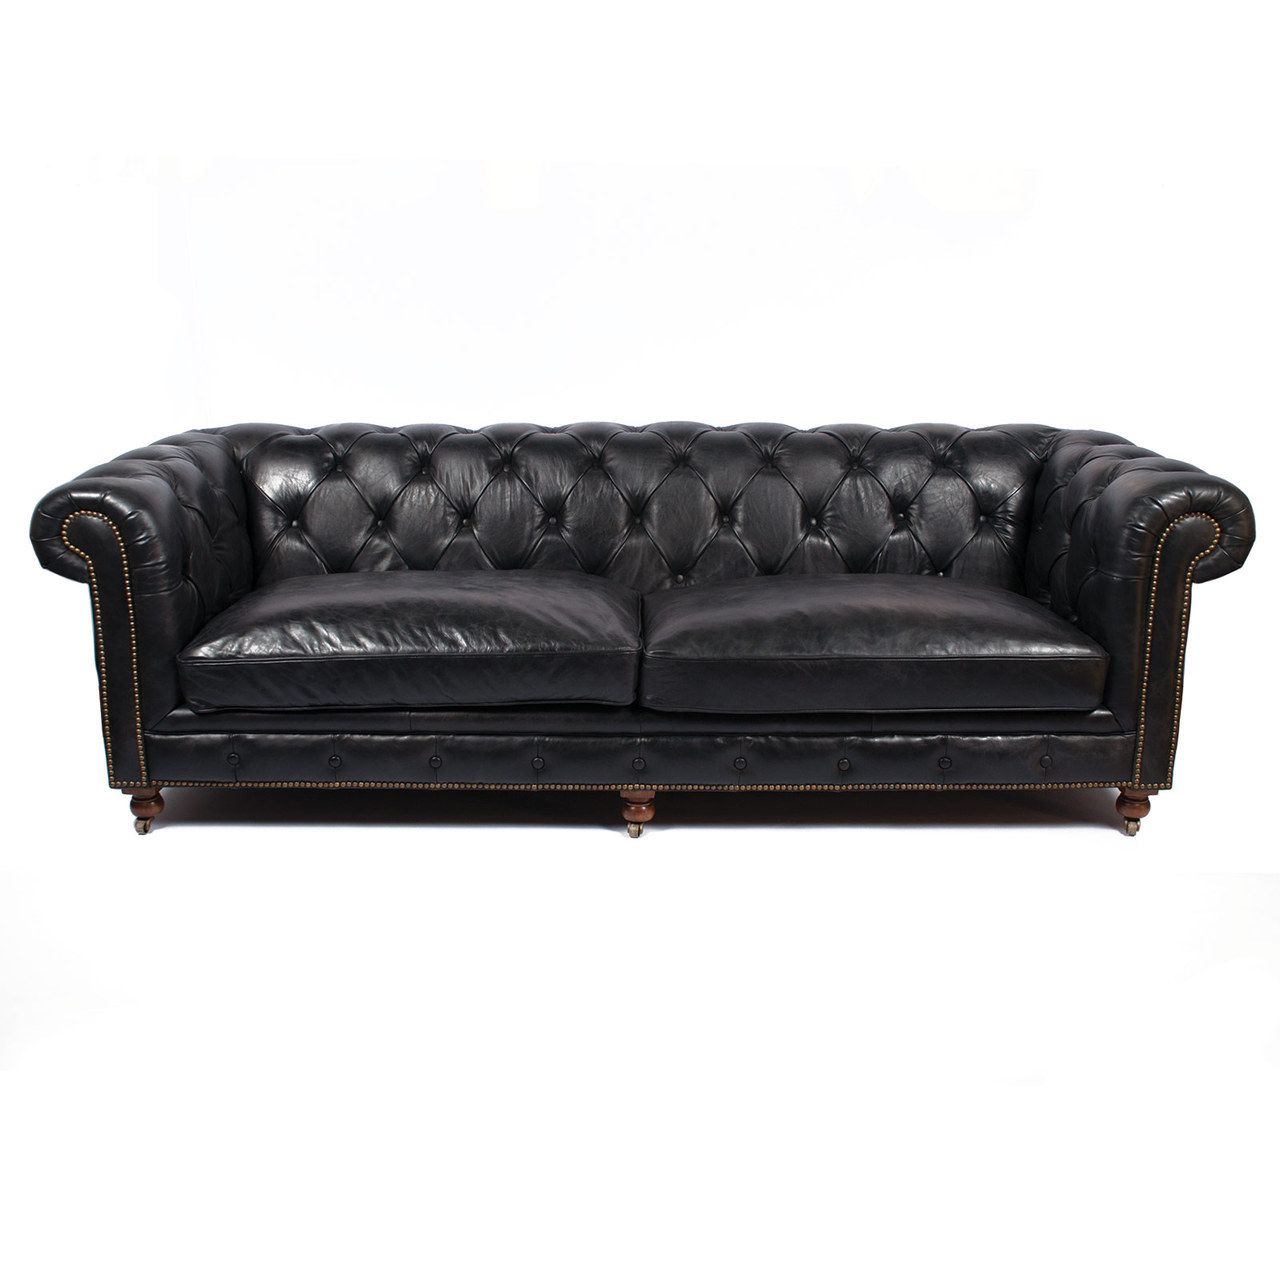 Nep Leren Slaapbank.Free Shipping Shop Austin Furniture Warehouse For The